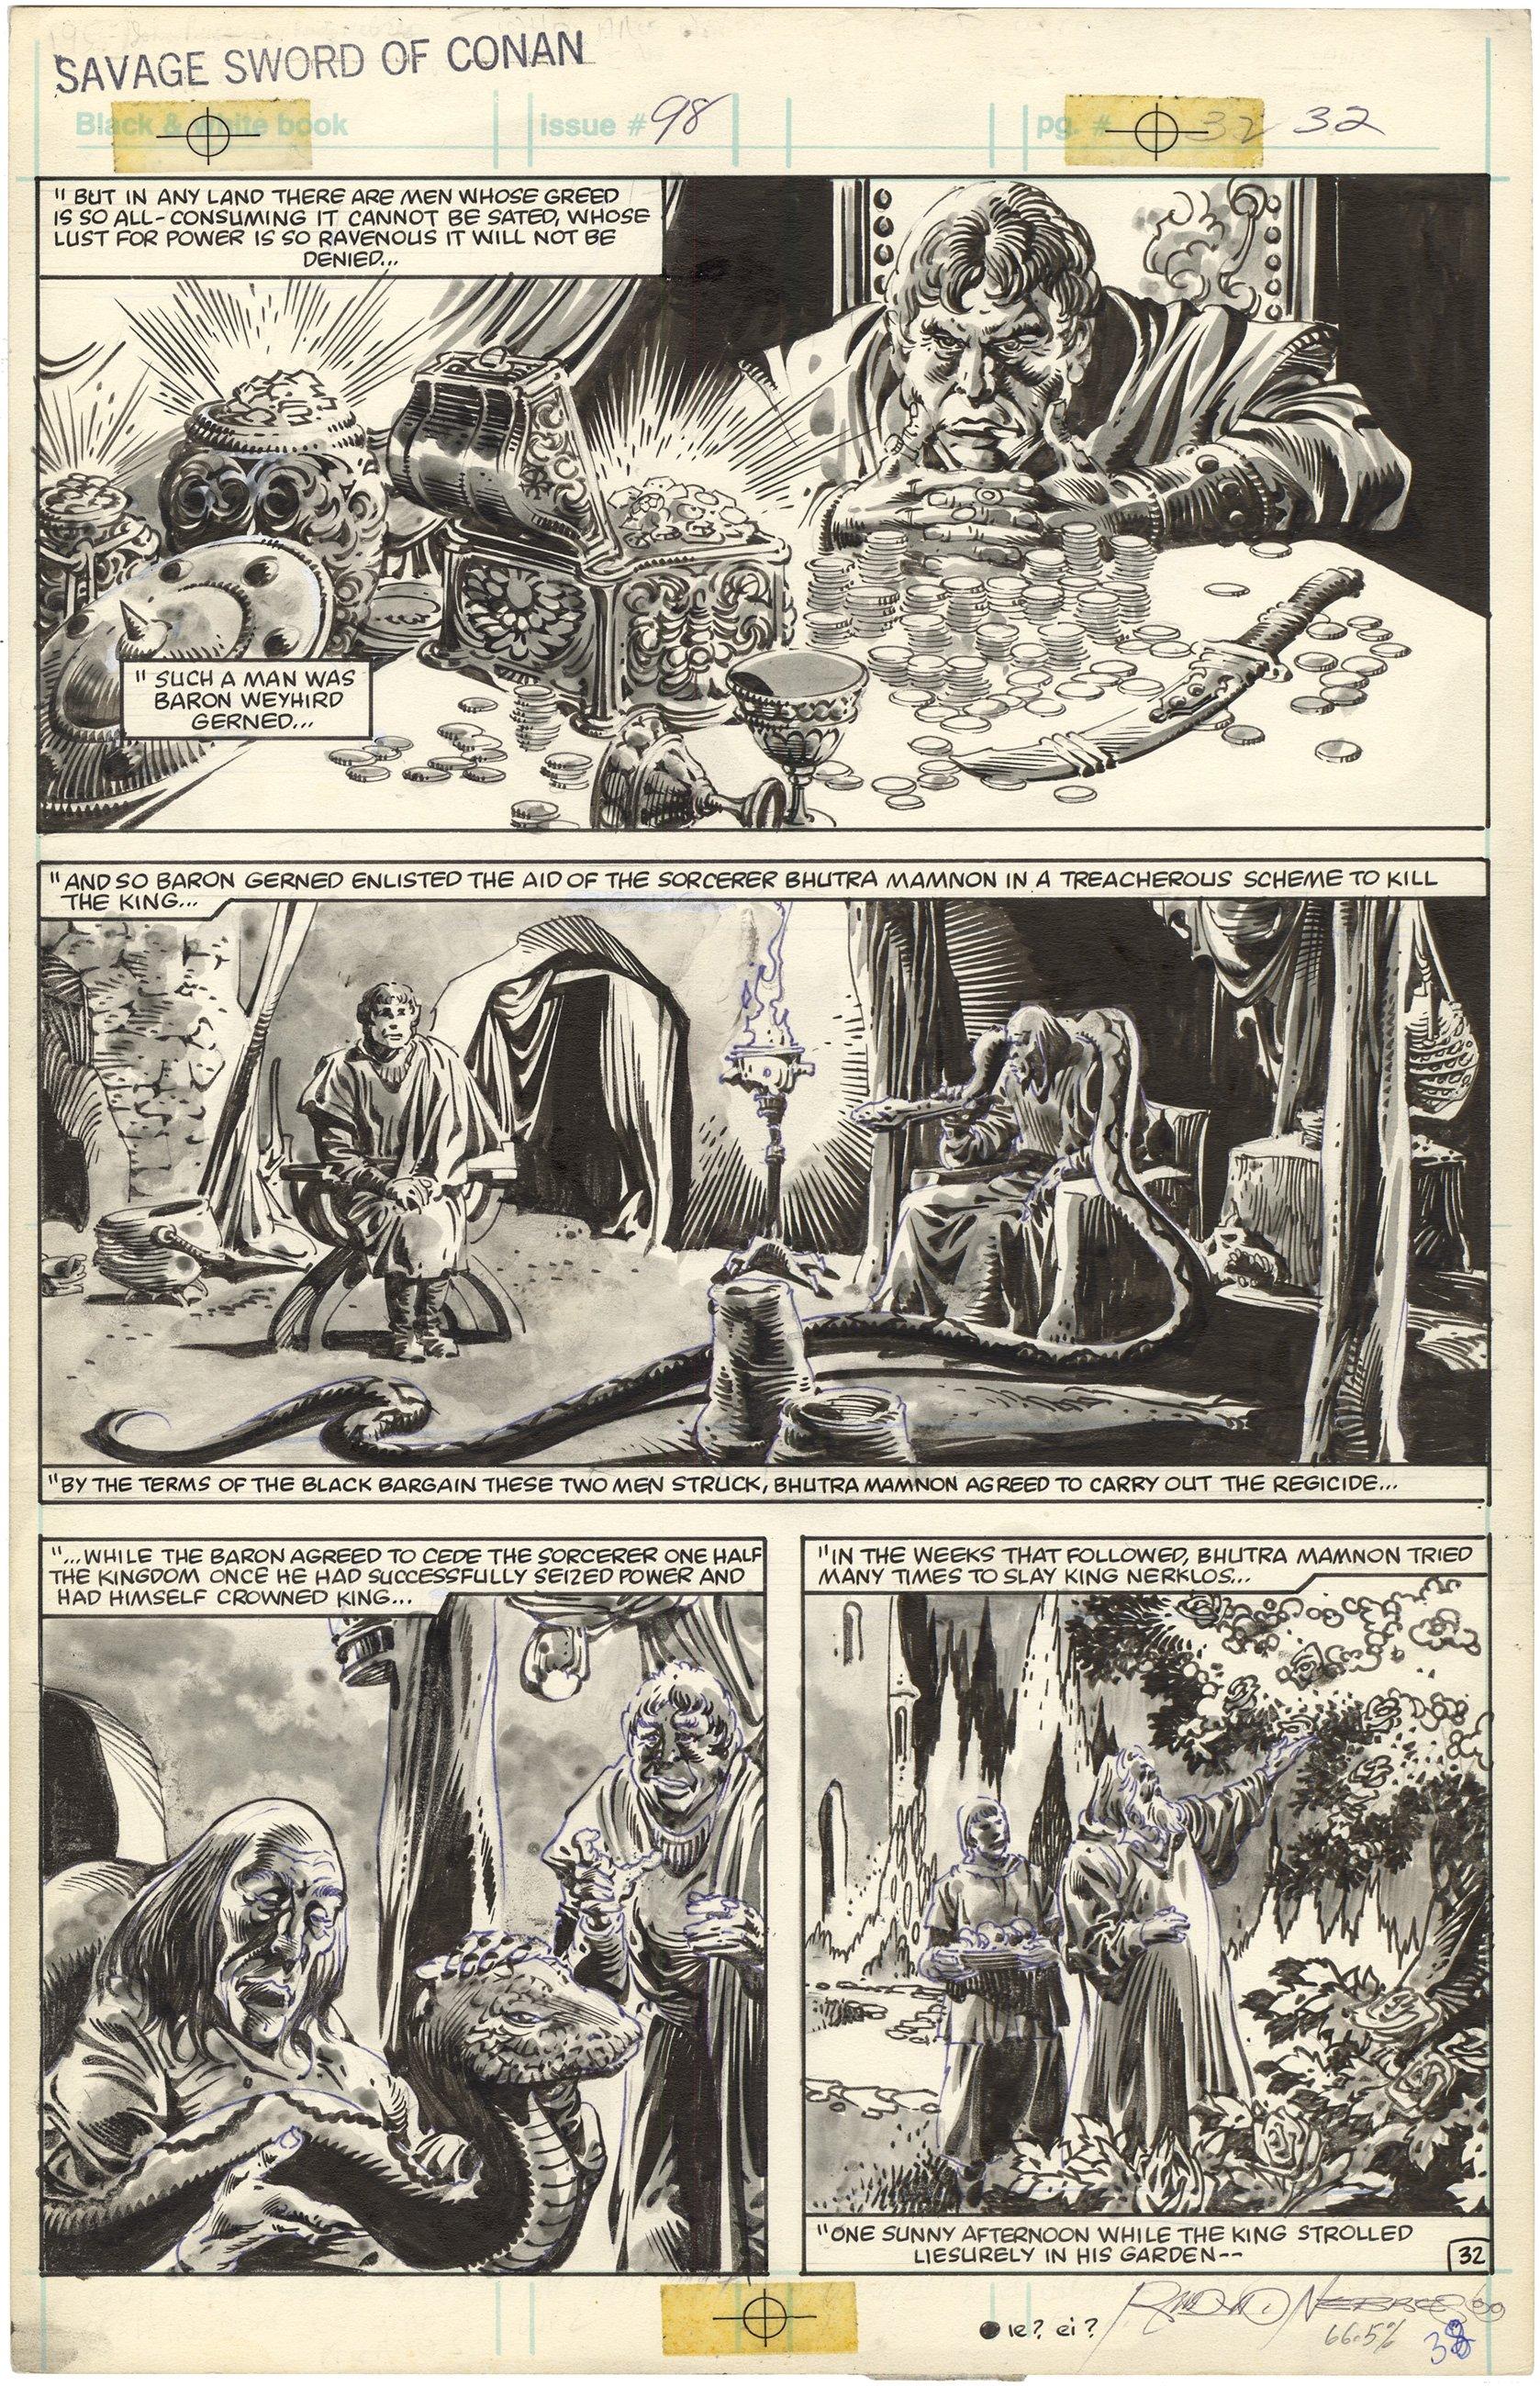 Savage Sword of Conan #98 p32 (Signed)